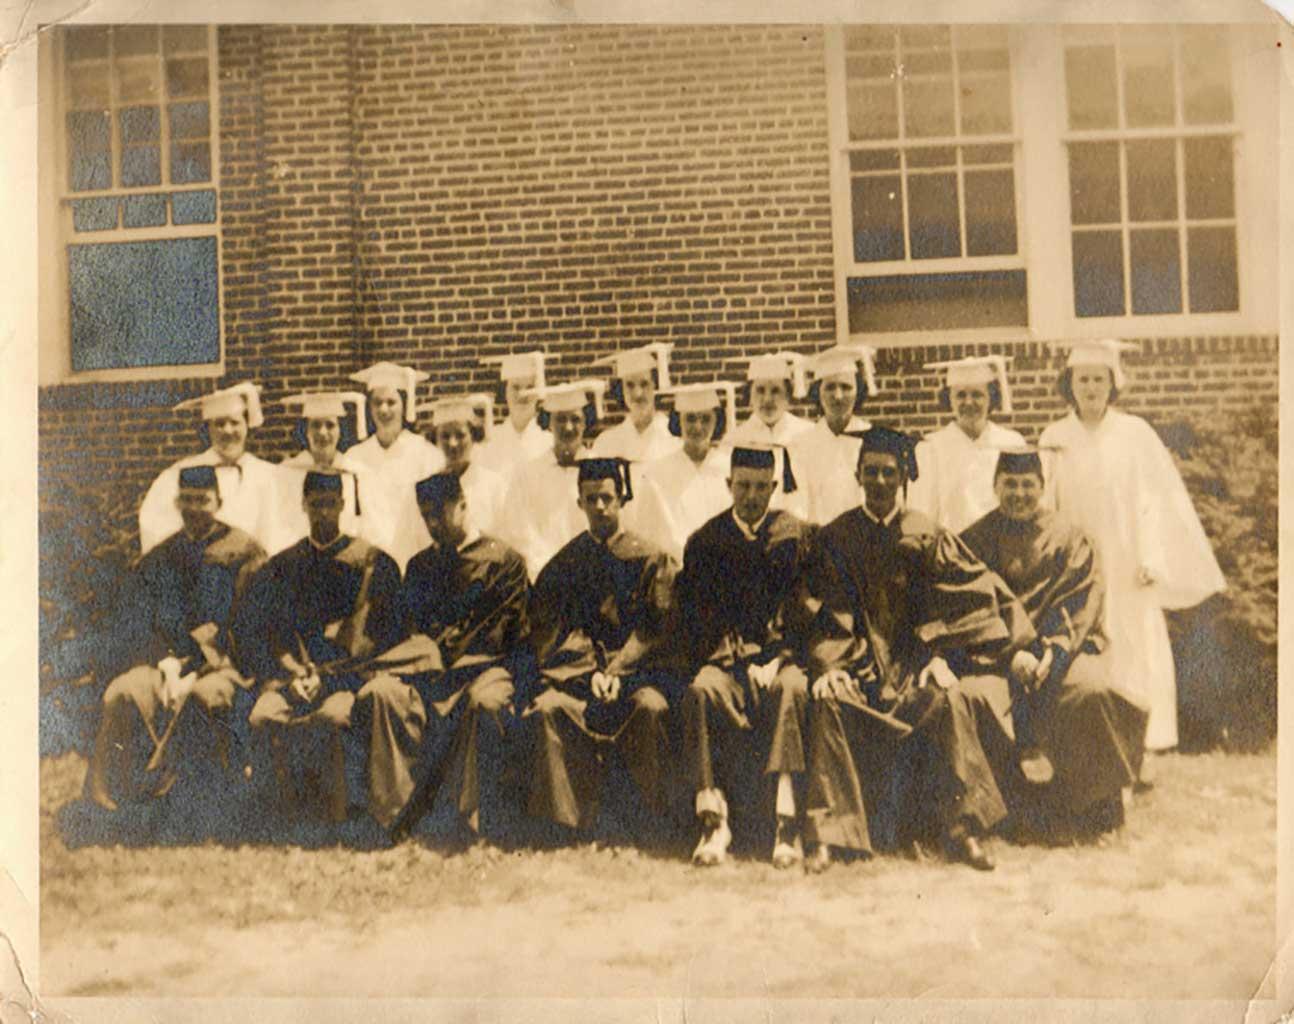 chuckatuck-high-school-graduating-class-1938-mg558